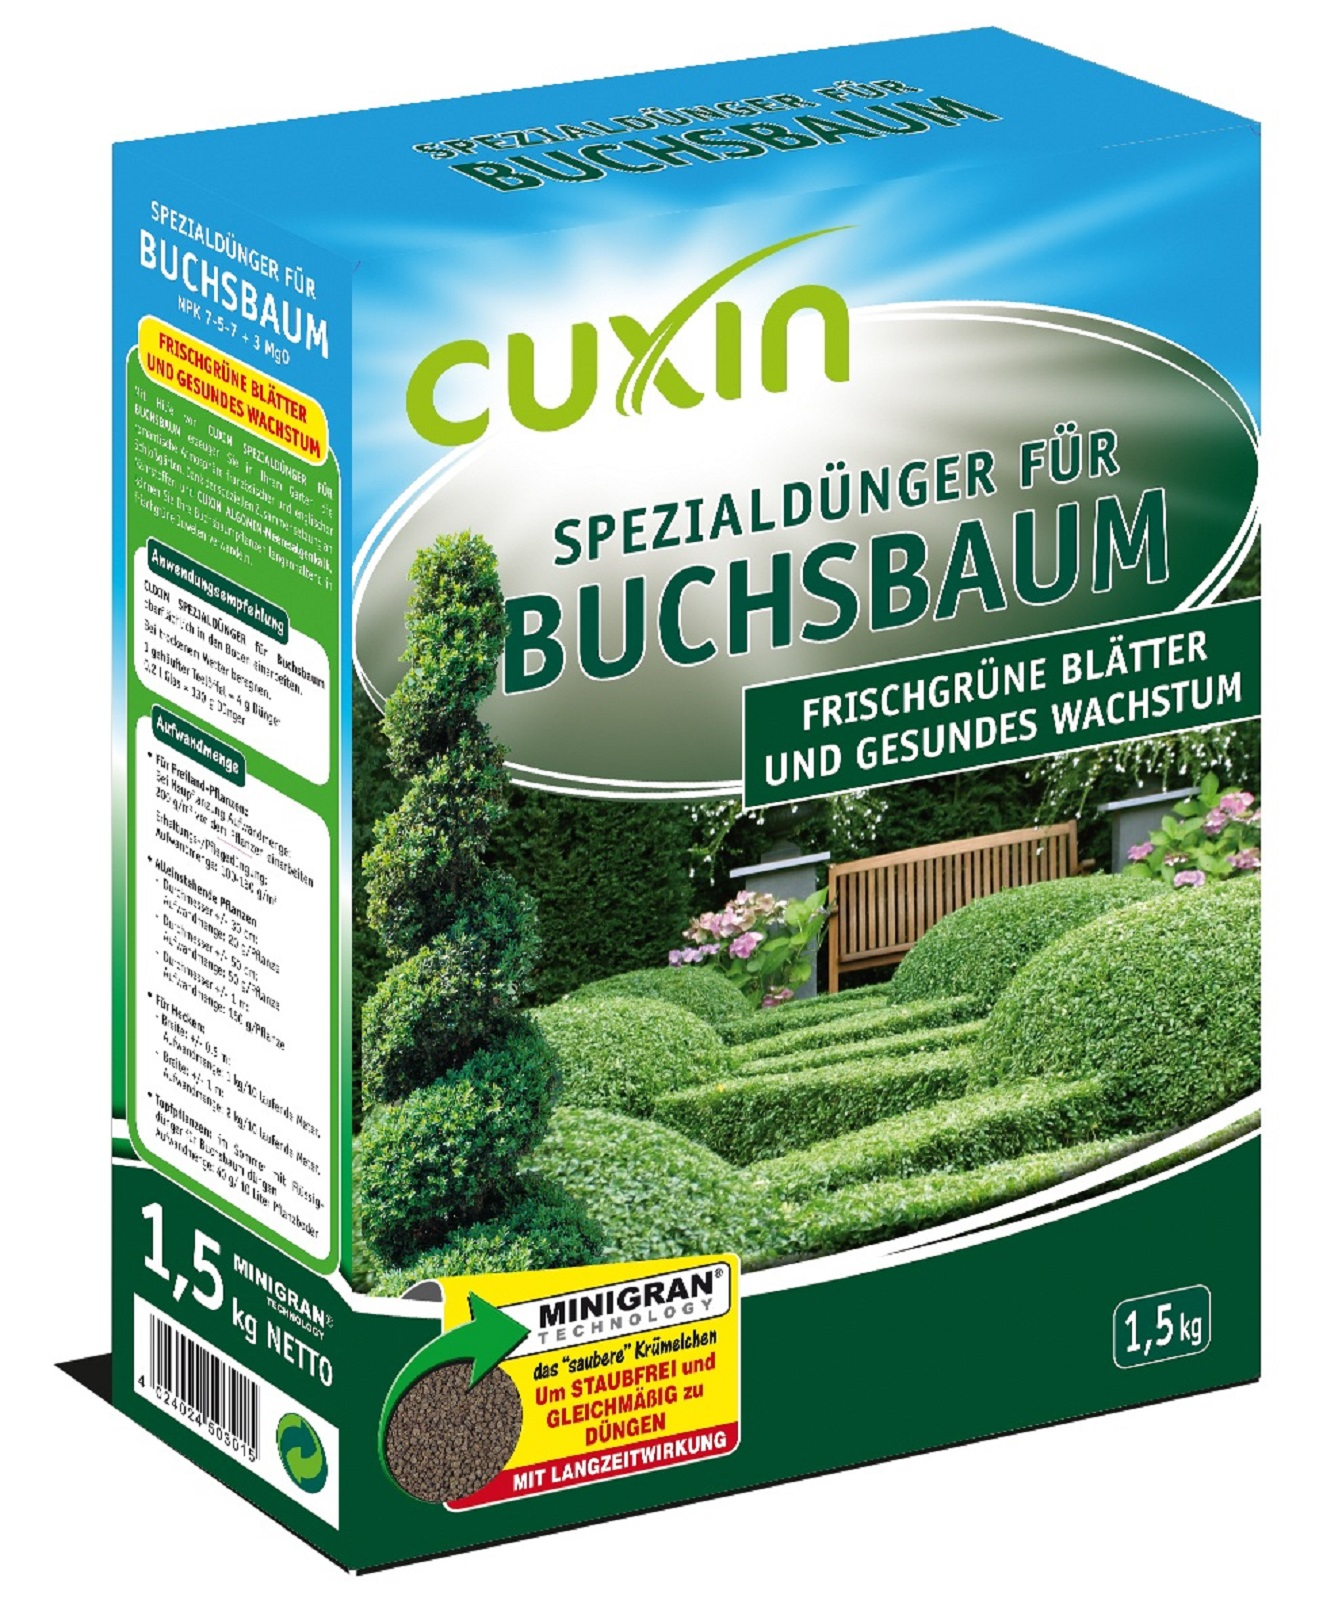 Cuxin Buchsbaum, Spezialdünger,1,50 kg Minigran, Dünger